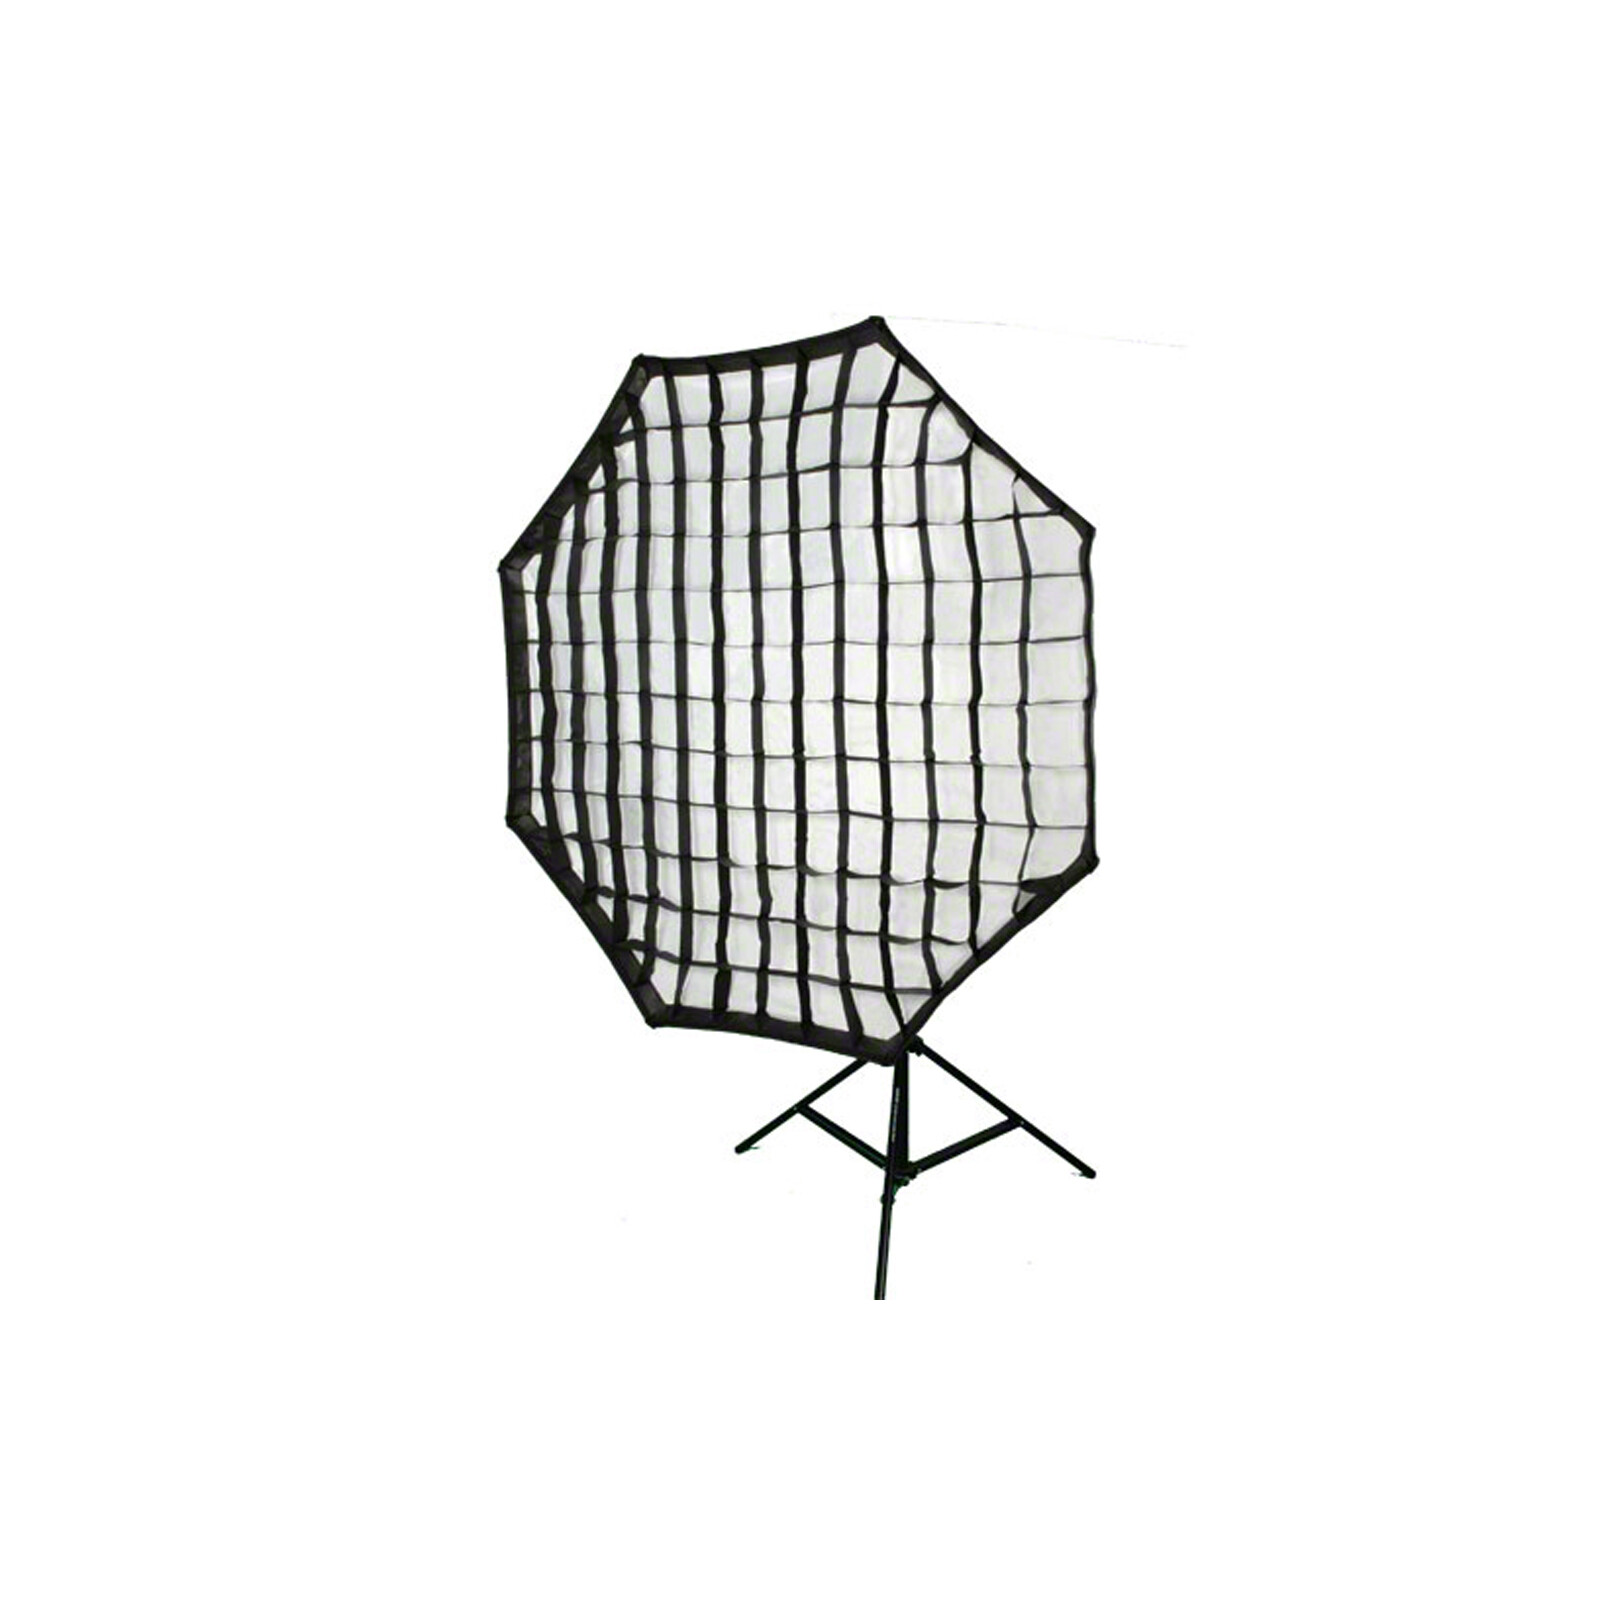 walimex pro Octagon Softbox PLUS 150cm für Profoto